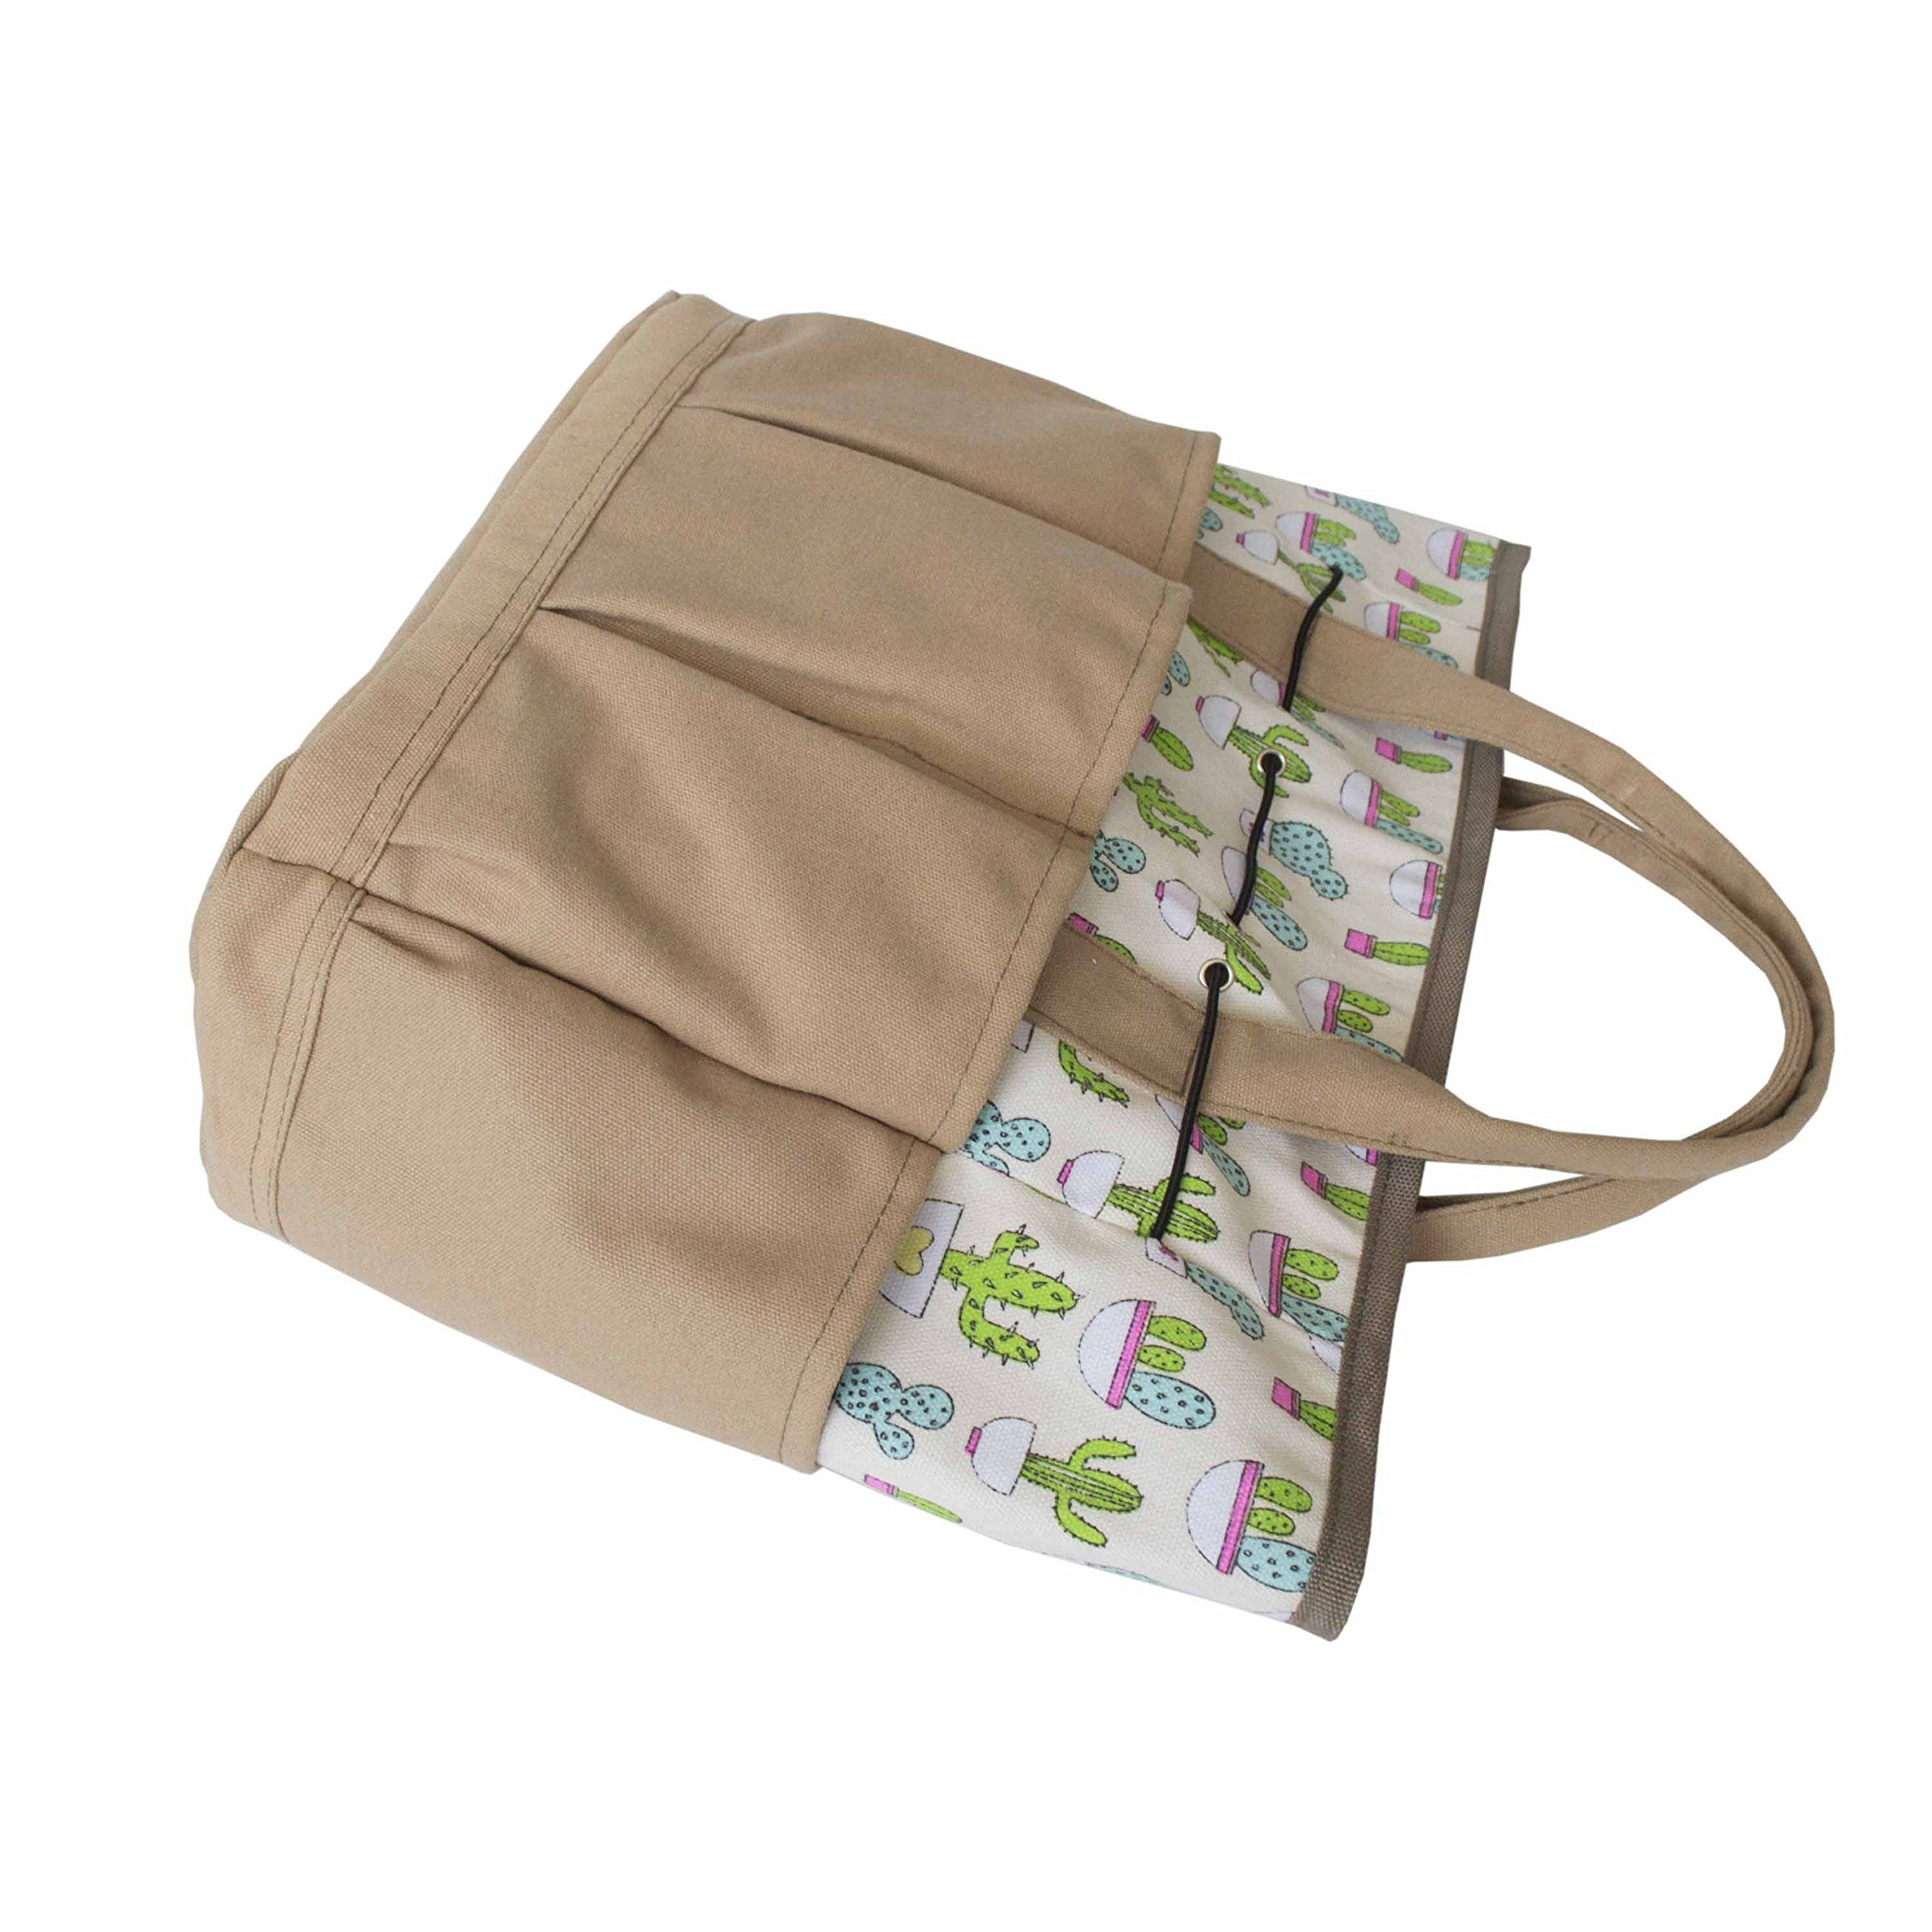 636db96328fb Outdoor Multi Pocket Gardening Tool Organizer Tote Bag Carrier ...